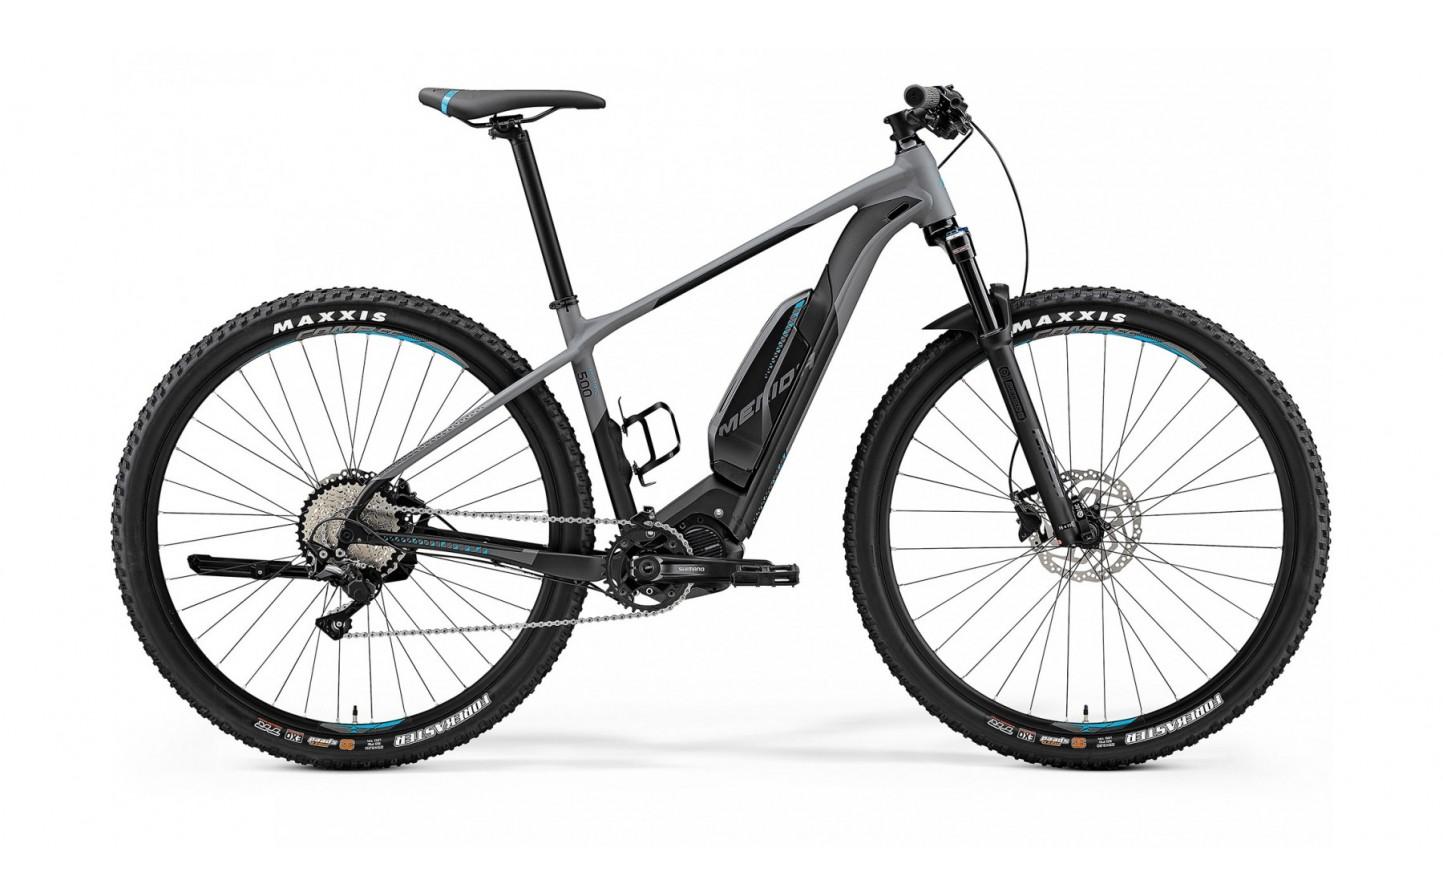 a3e9ccc00 Bicicleta Merida 19 E BIG NINE 500 2019 - Fabregues Bicicletas